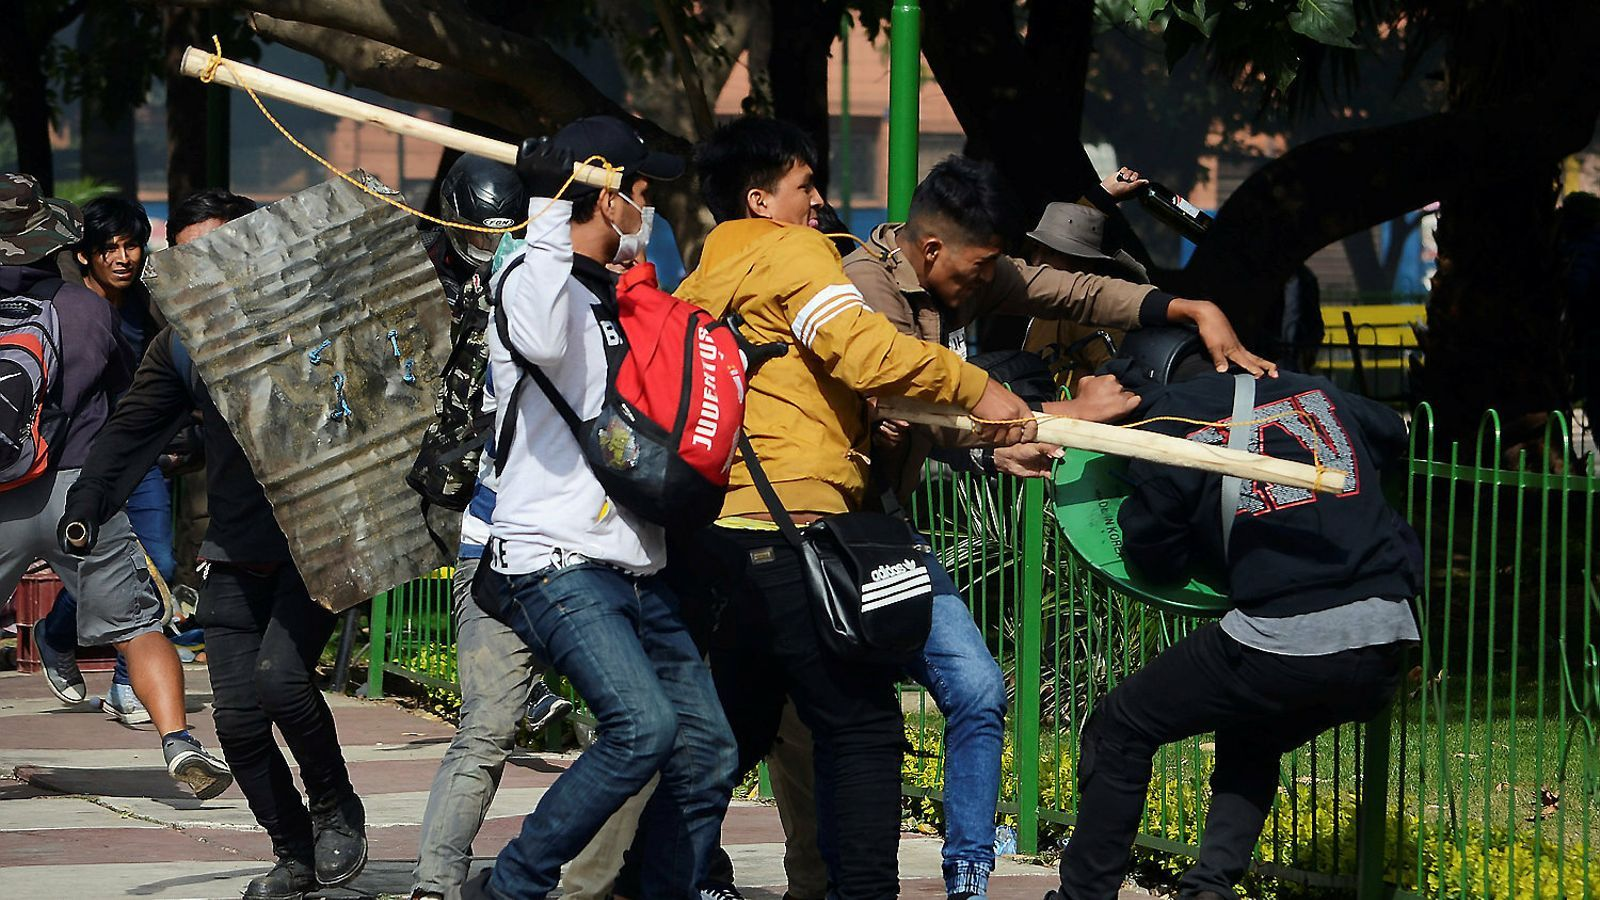 Bolívia s'endinsa en el caos